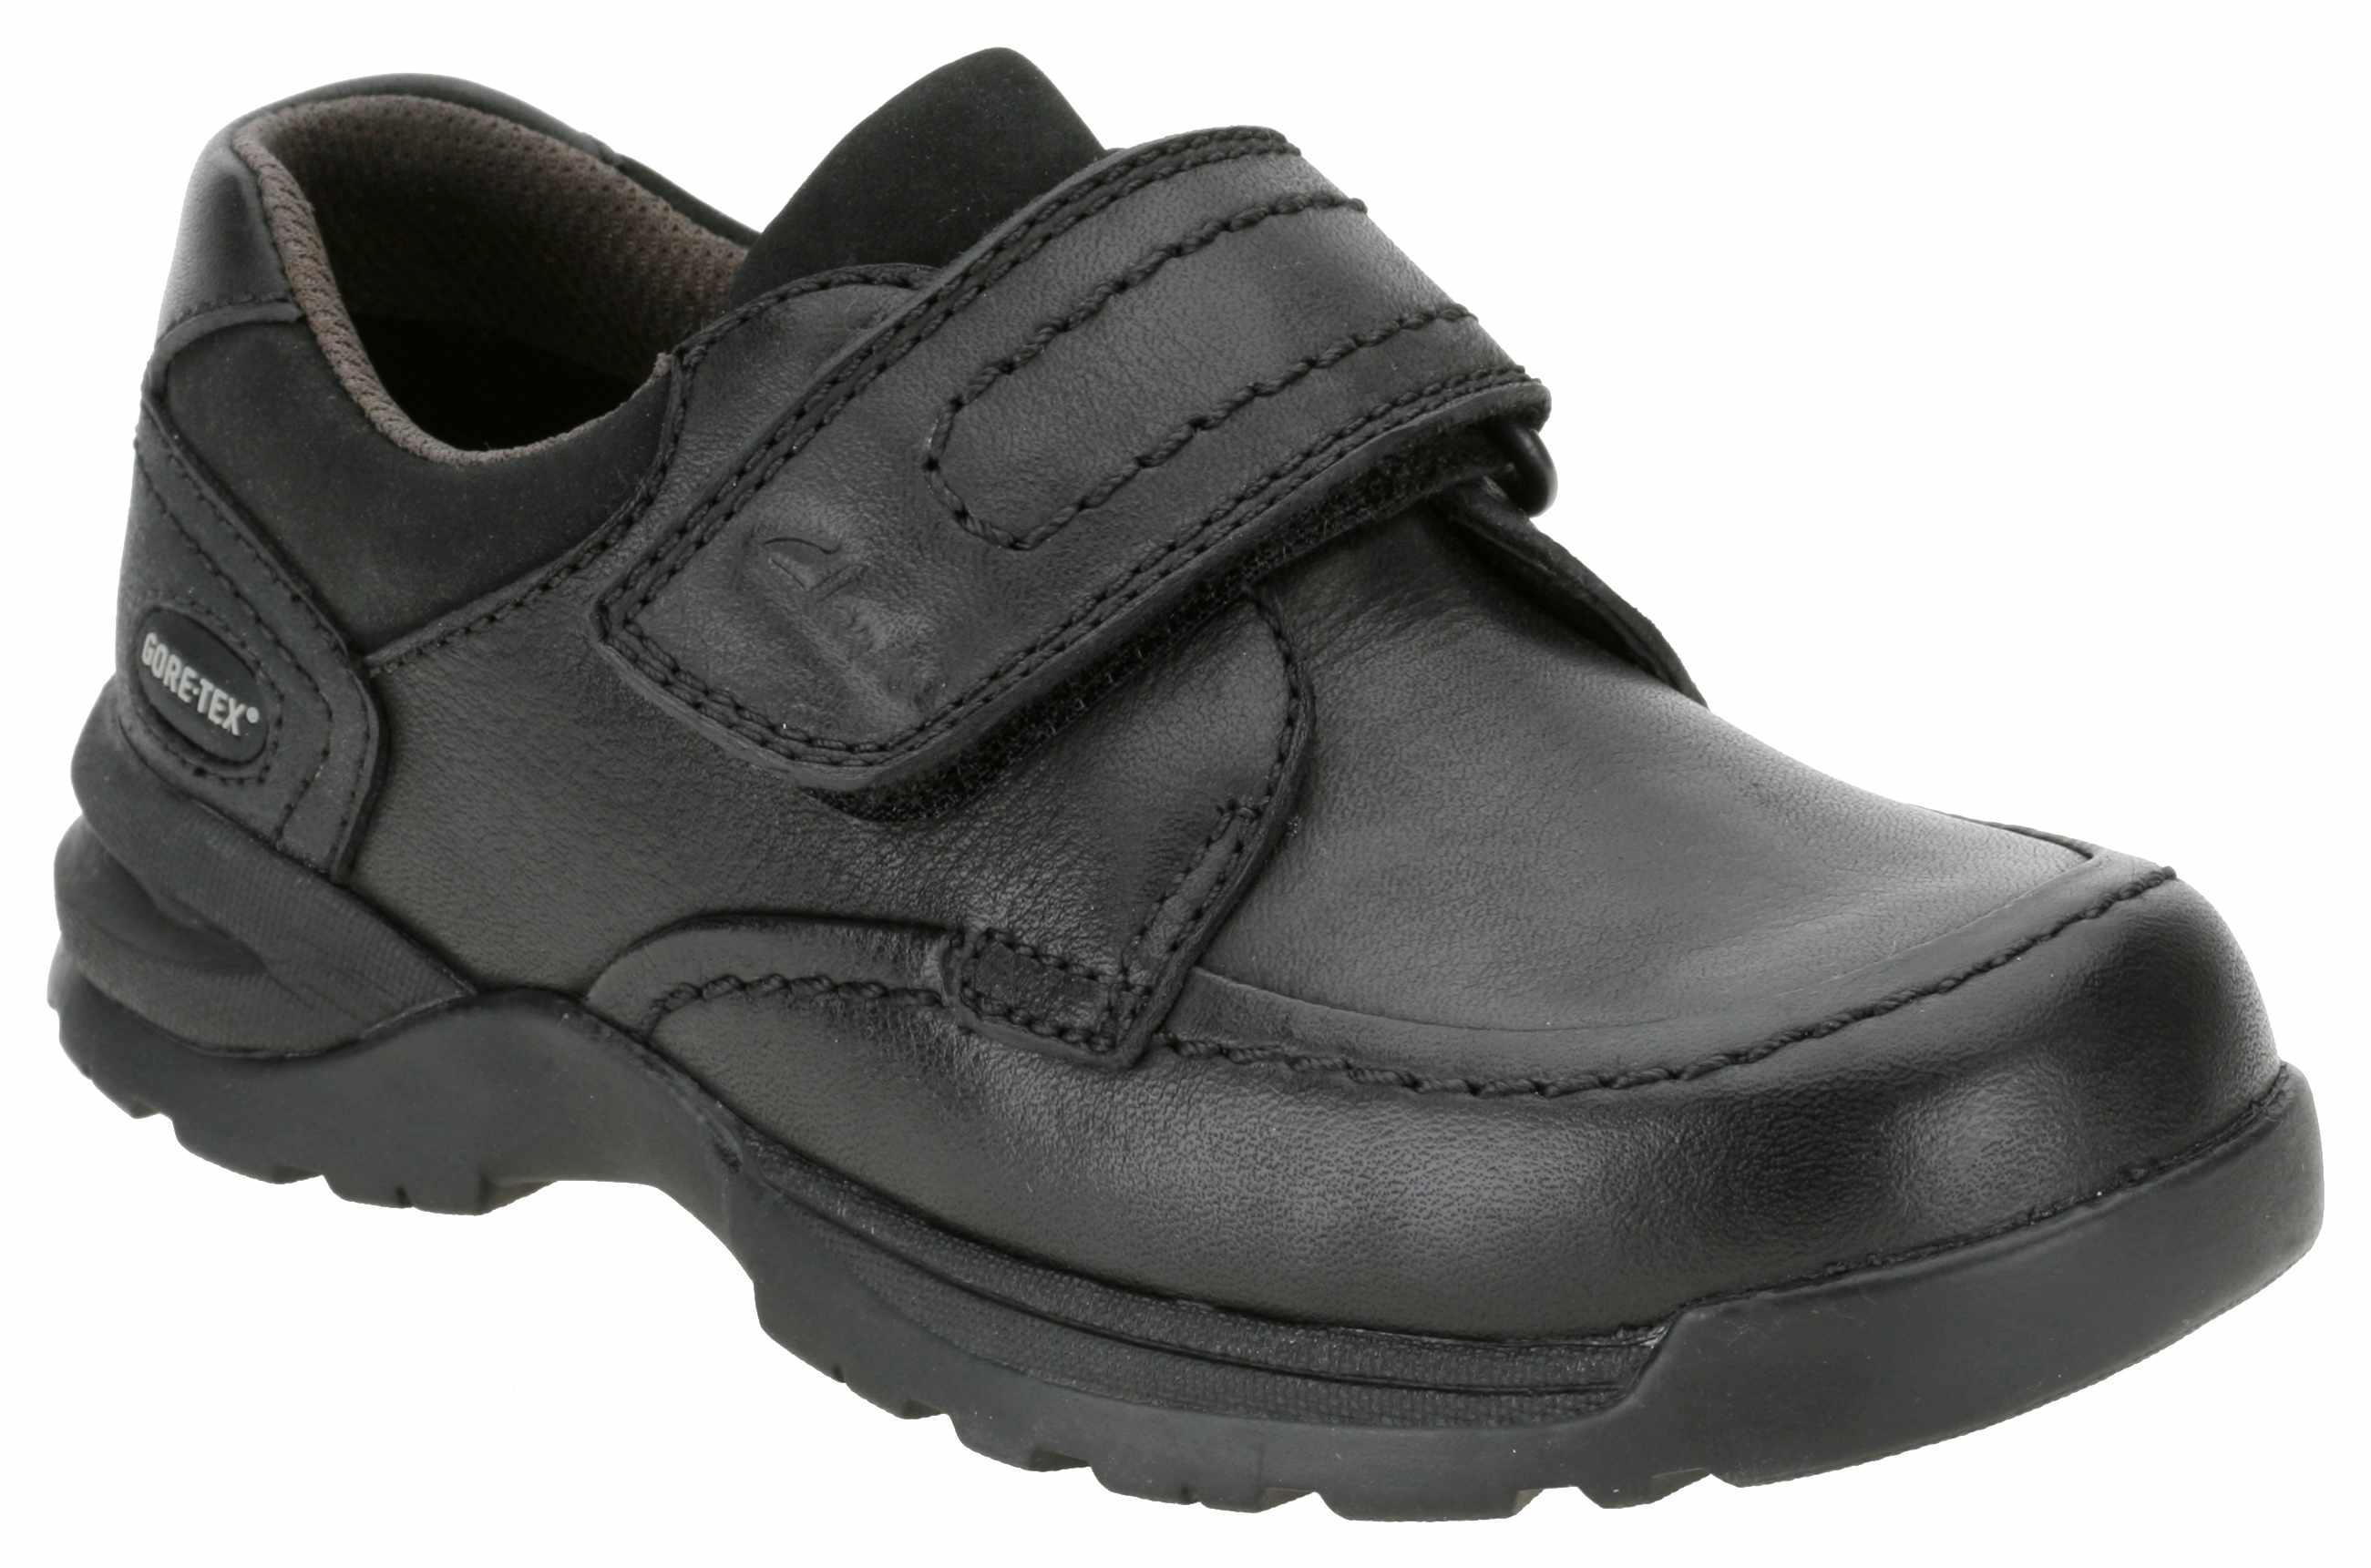 school-essentials-school-shoes-for-boys_25982